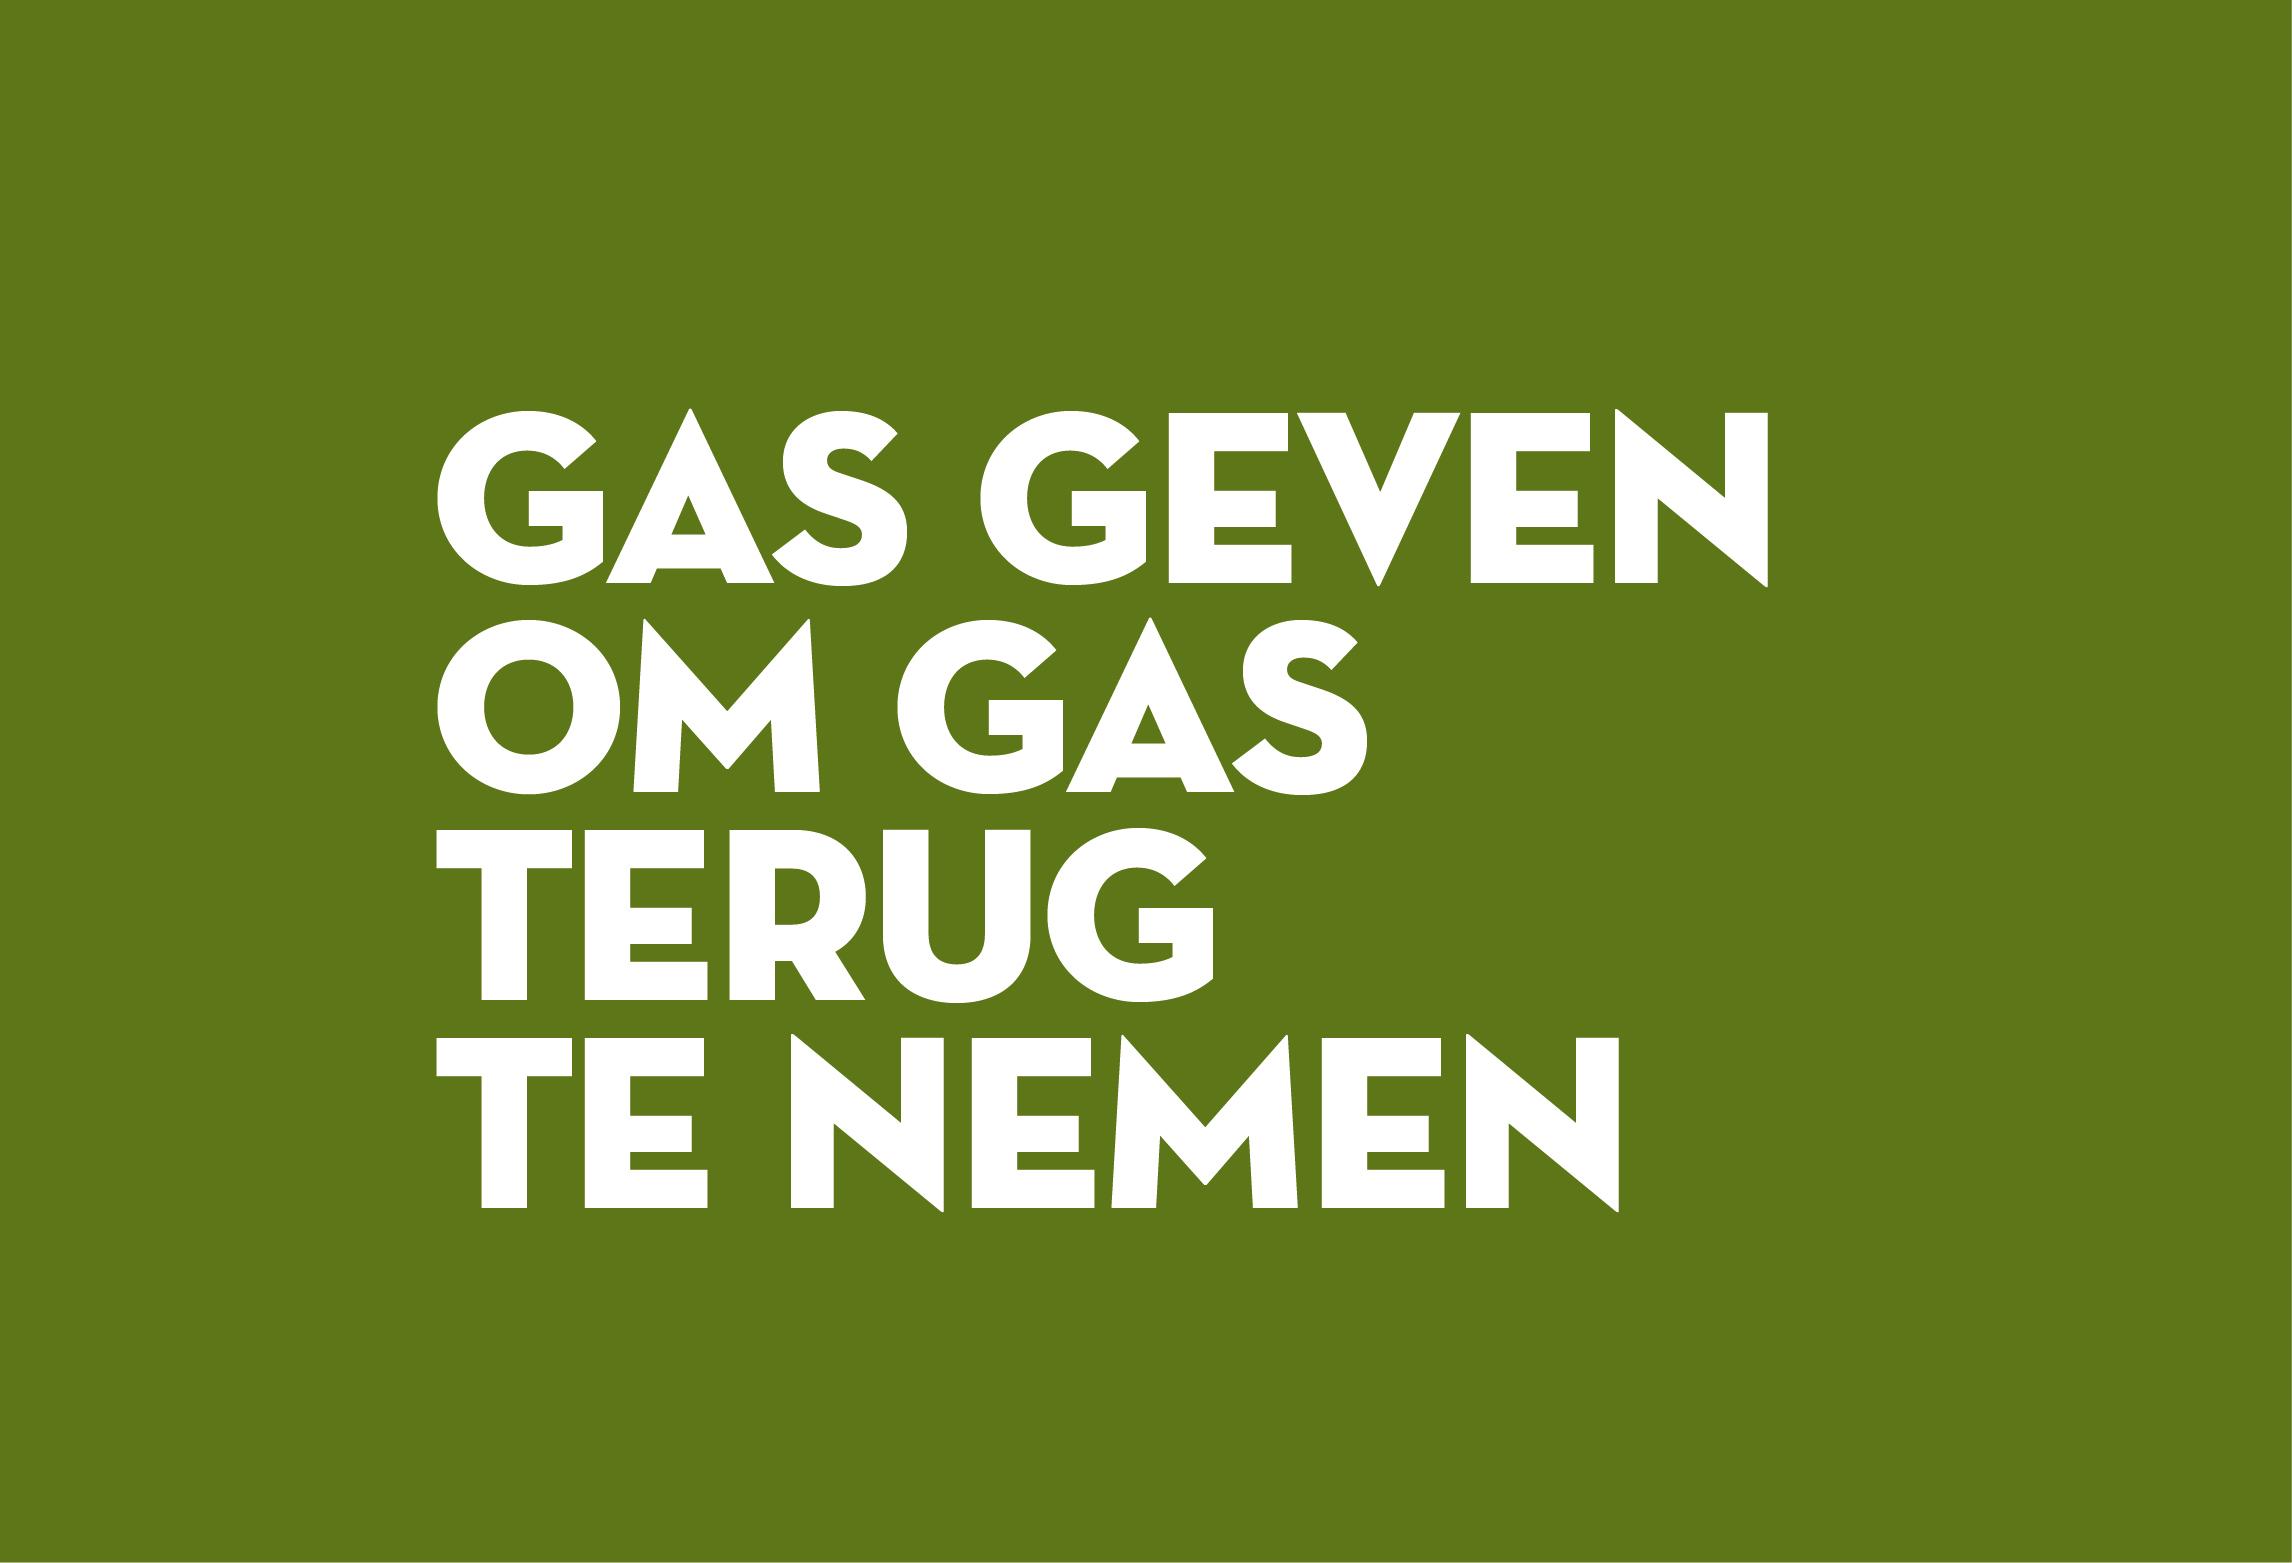 Case Groene Start